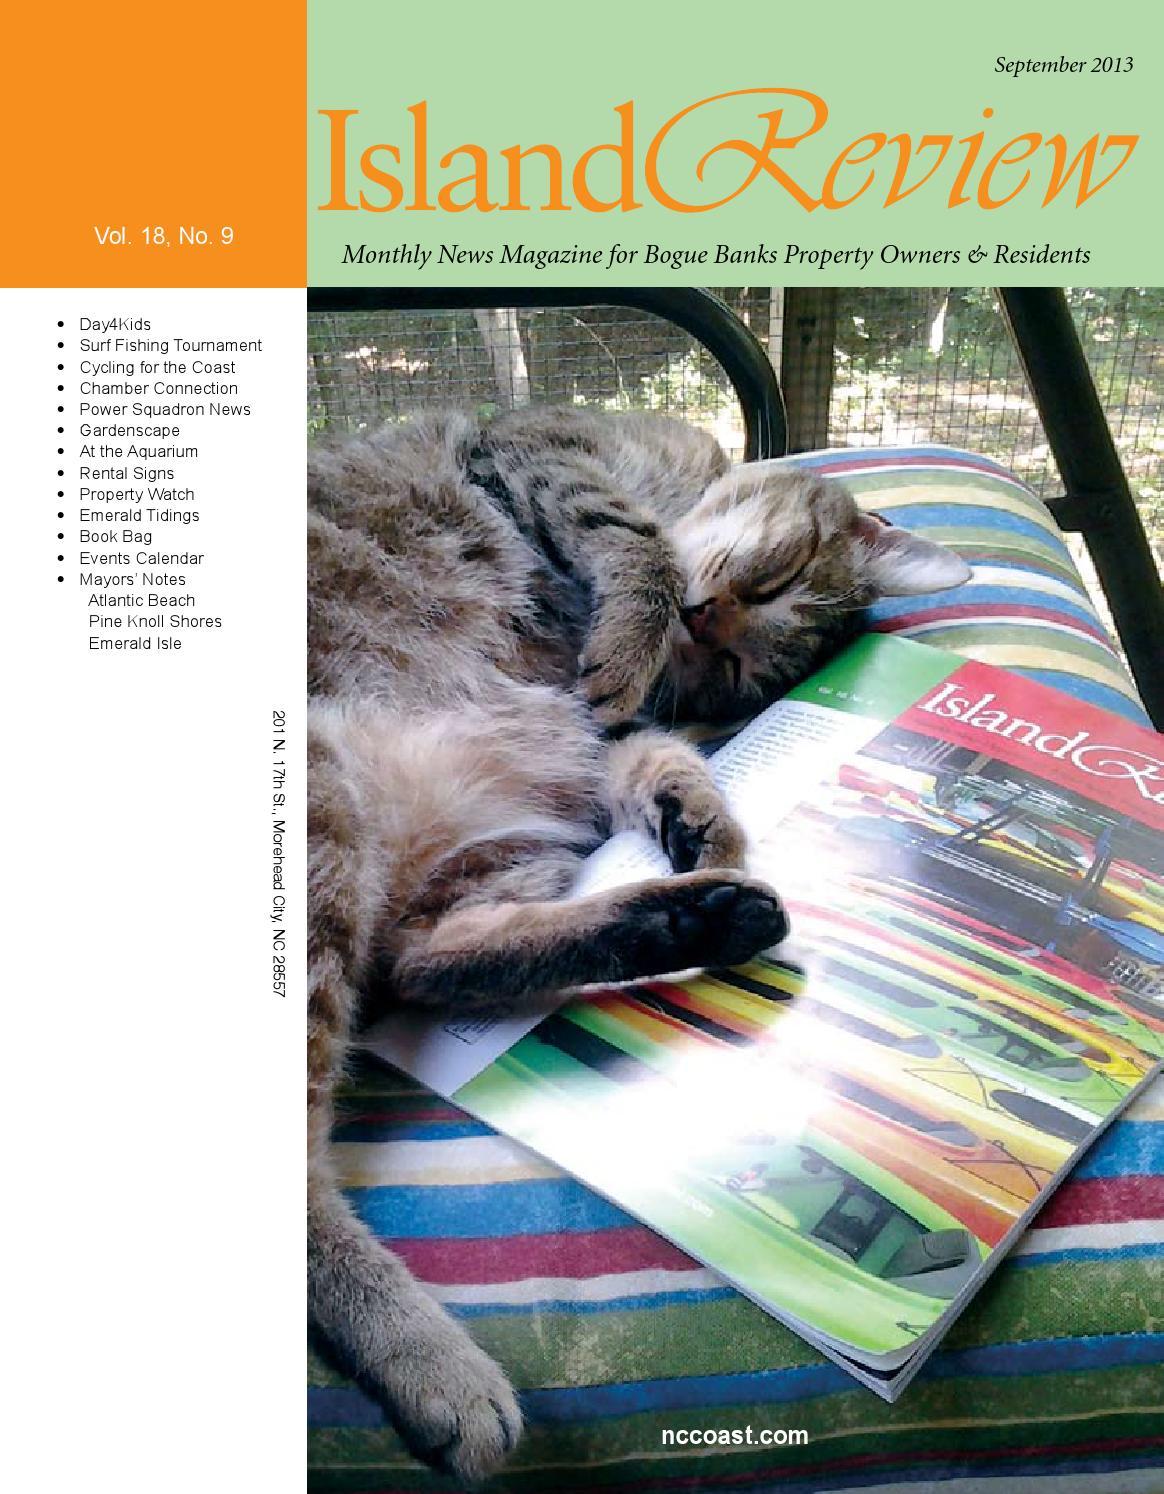 Island review magazine by nccoast issuu for Nc surf fishing calendar